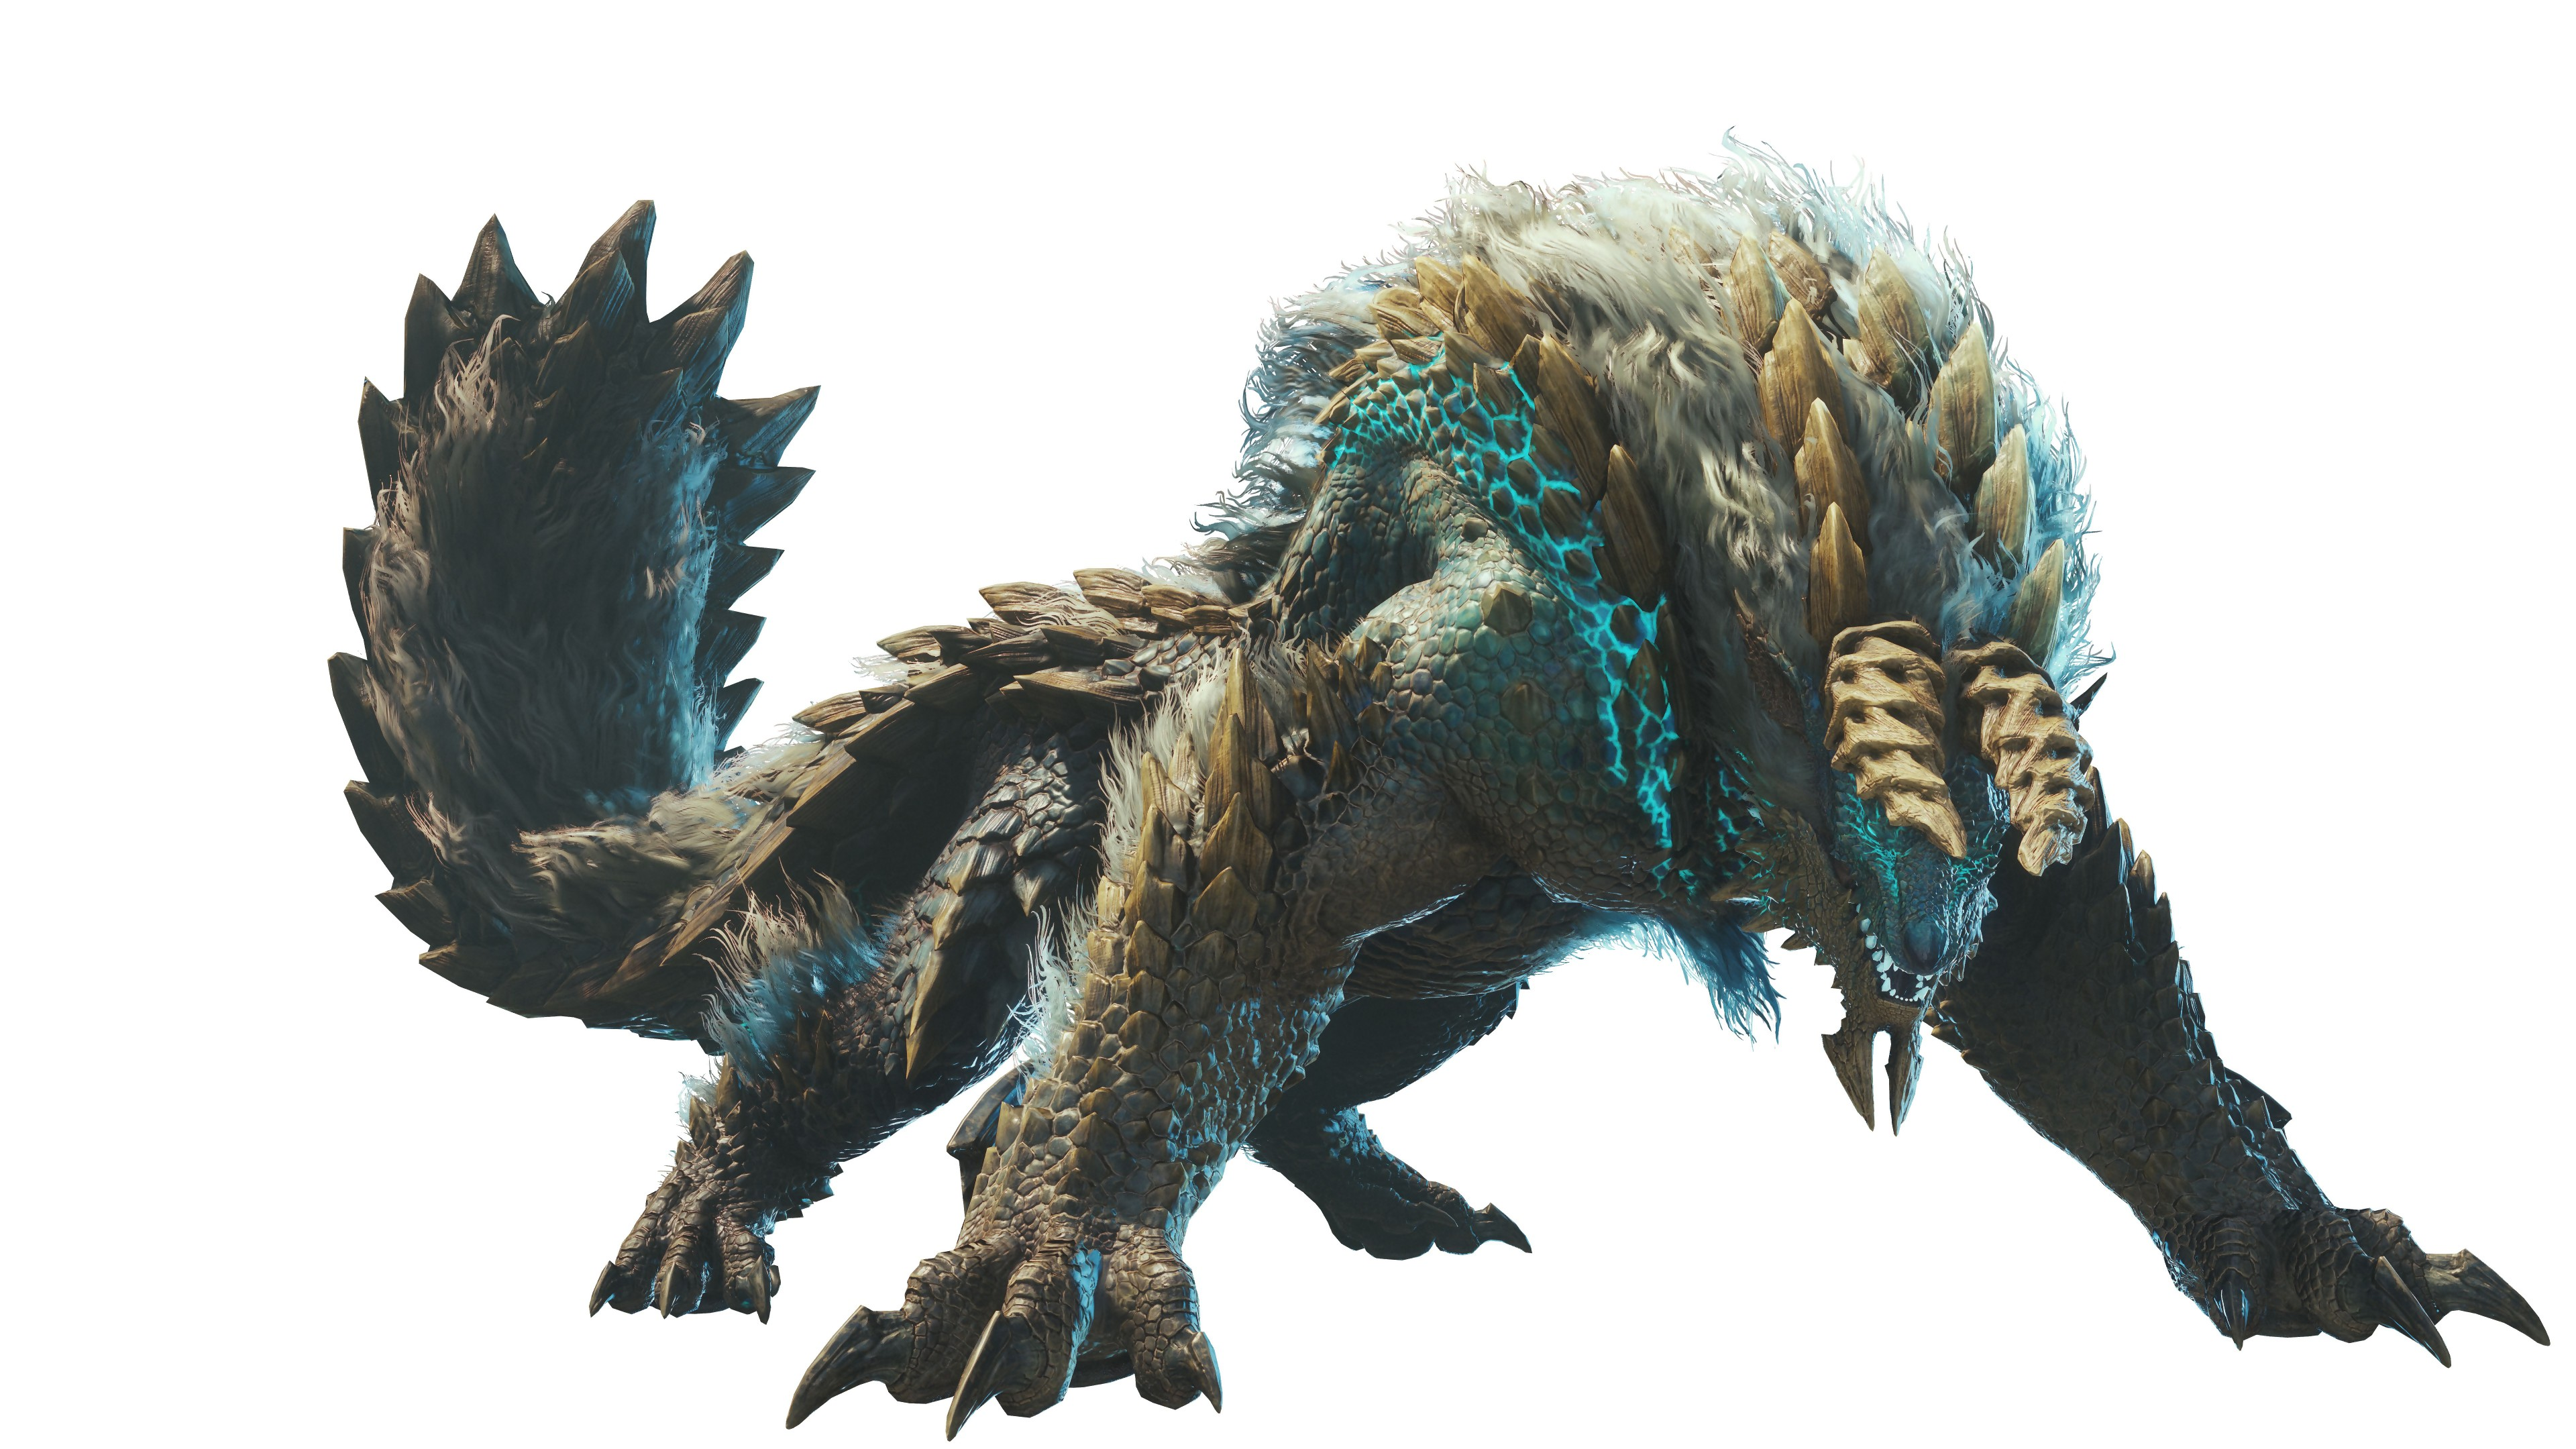 Monster Hunter World Iceborne Les Nouveaux Monstres En Video